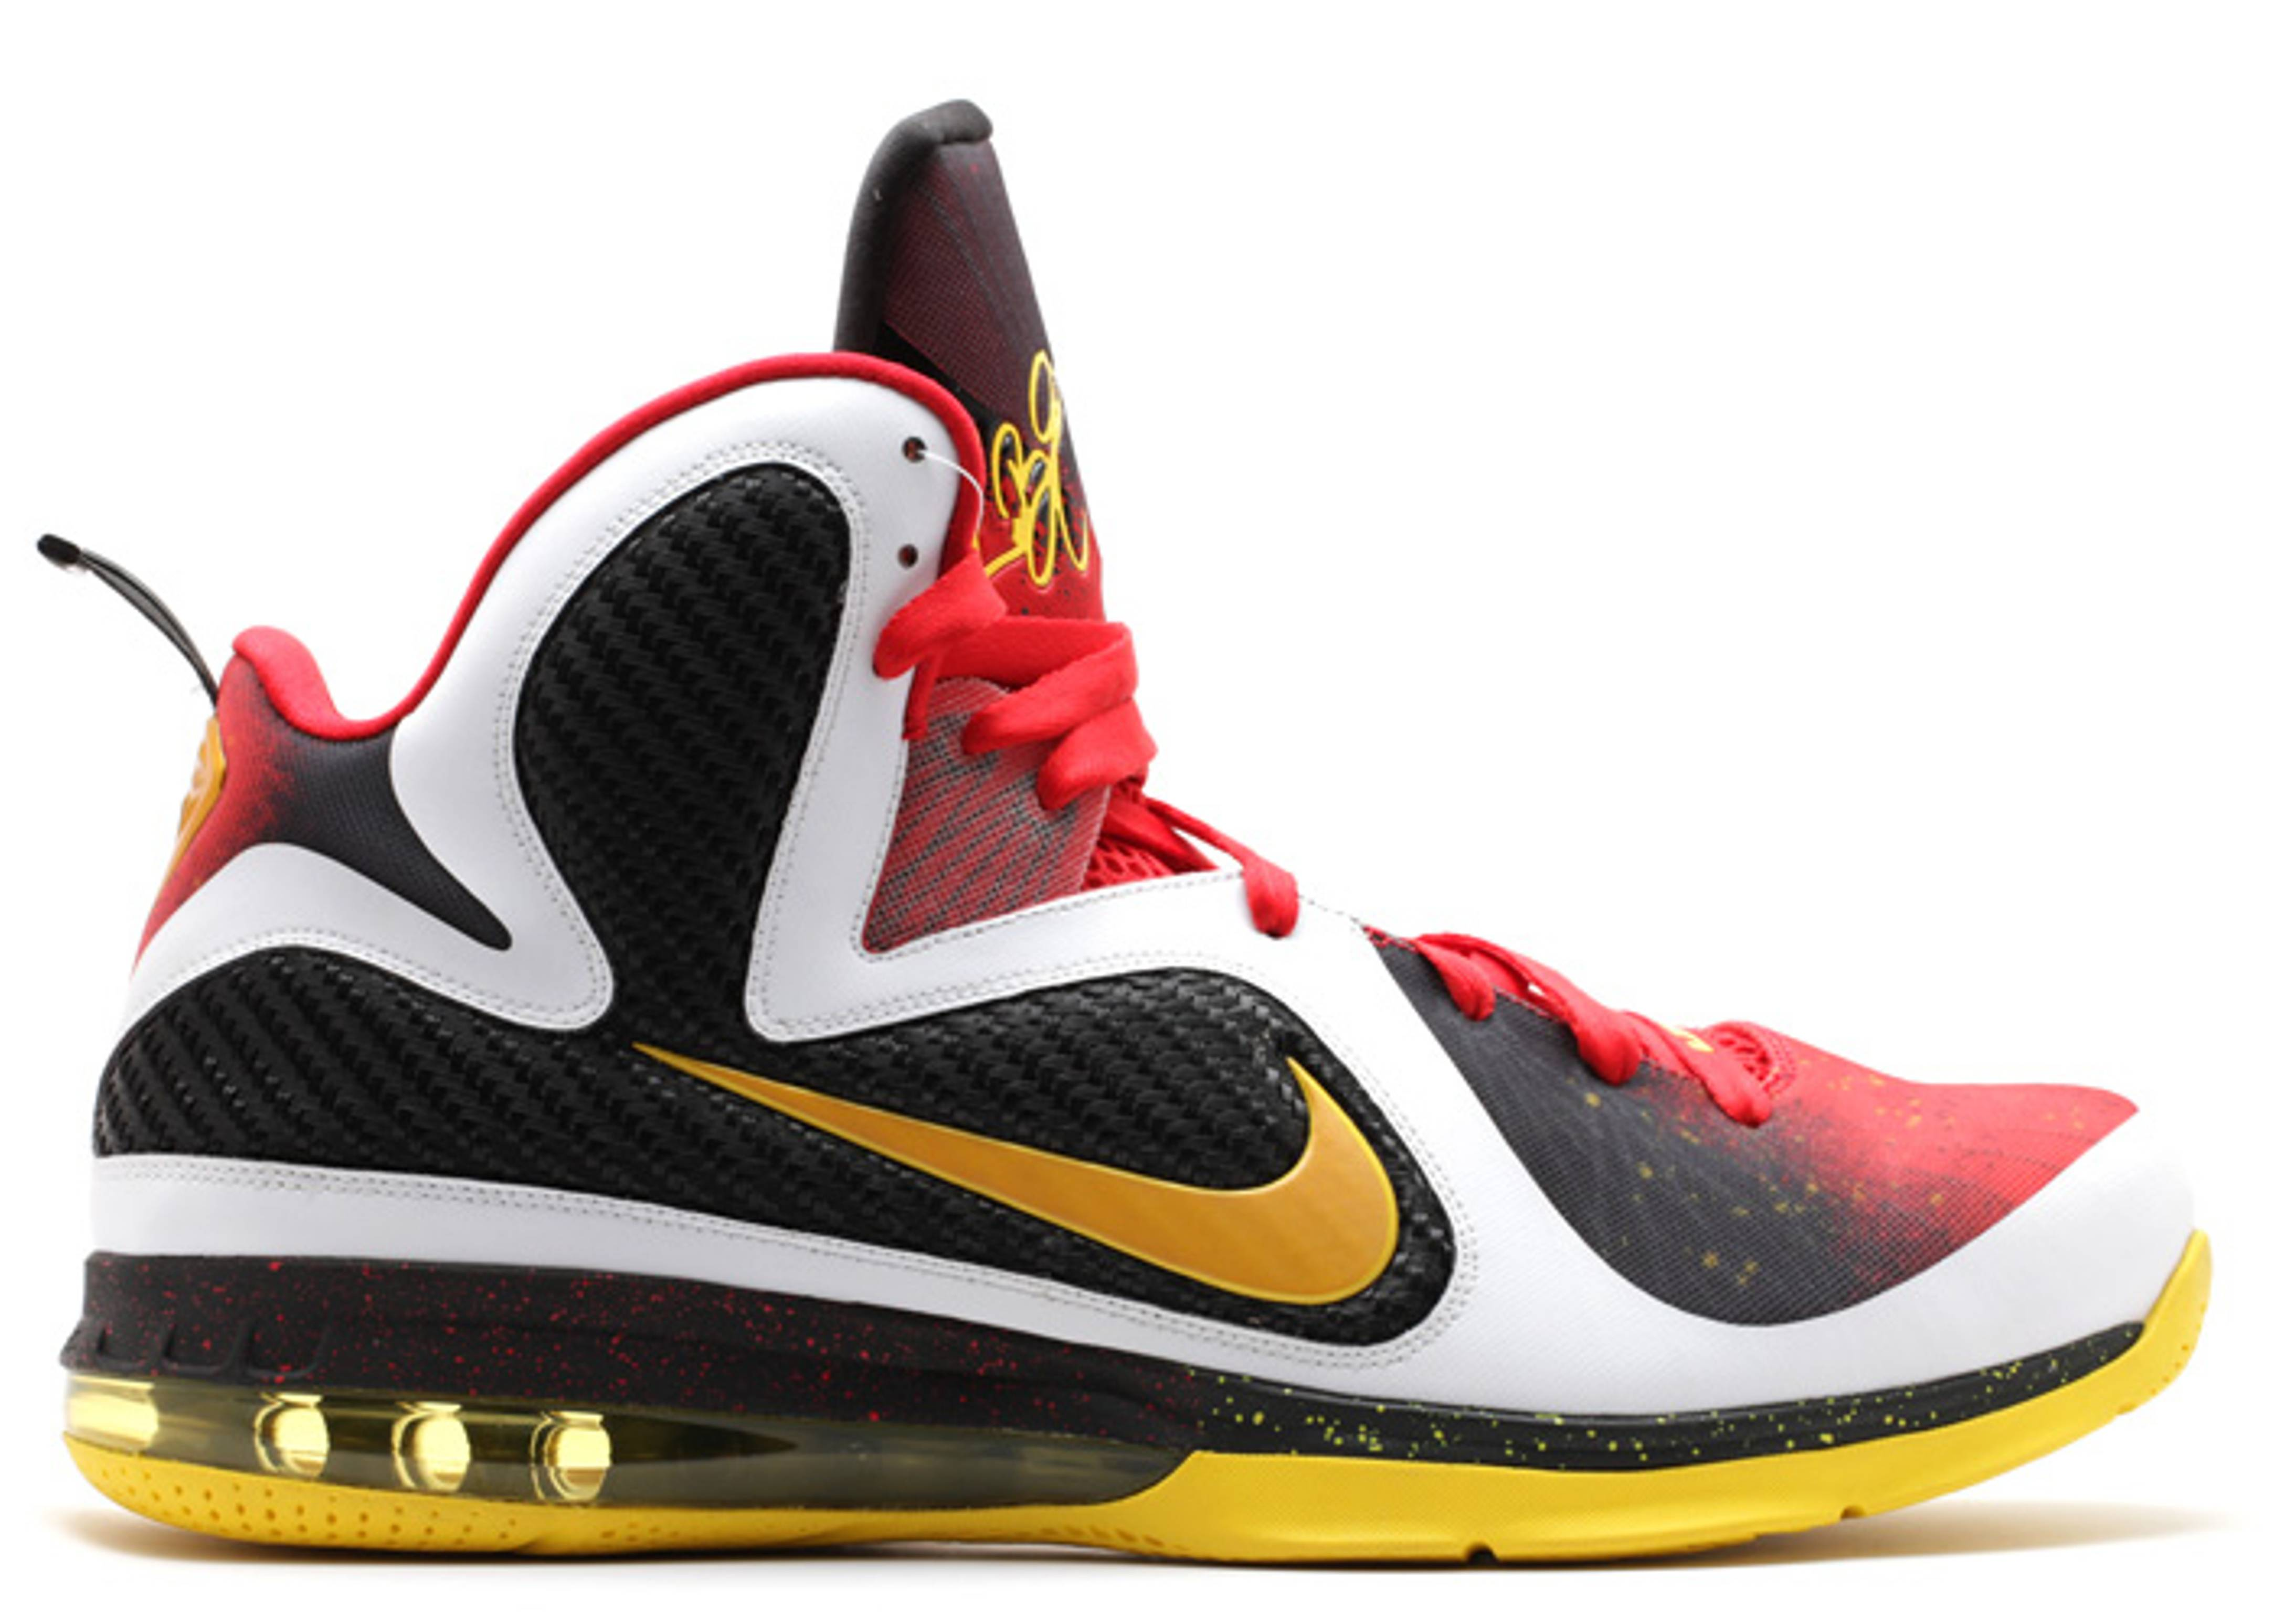 lebron 9 white-red-yellow/black